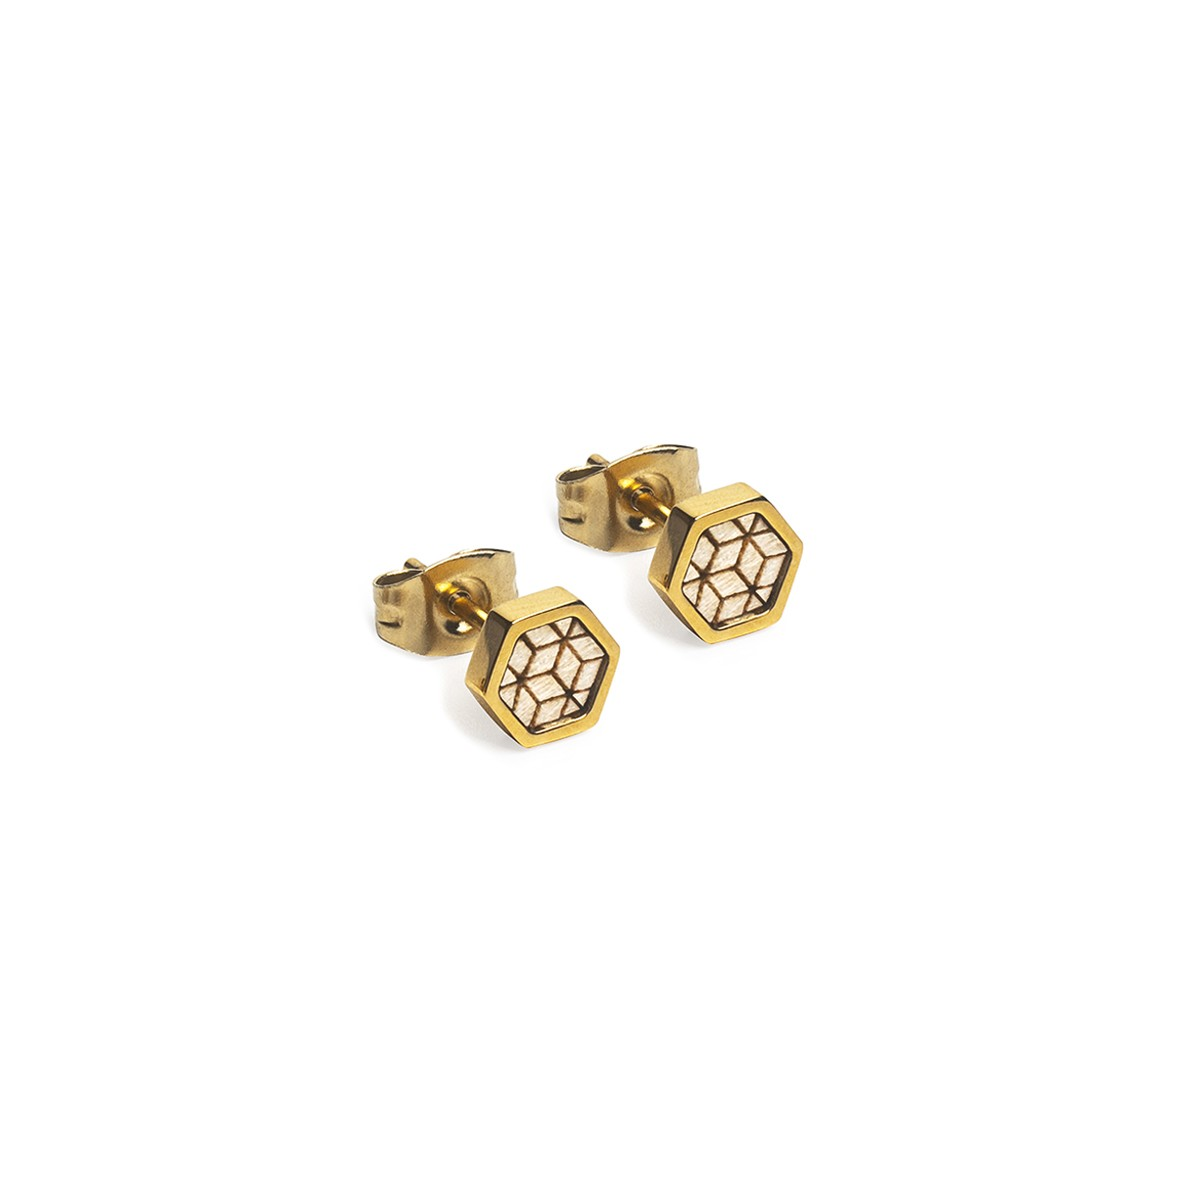 BeWooden Ohrringe - Ohrstecker mit Holzdetail - Virie Earrings Hexagon